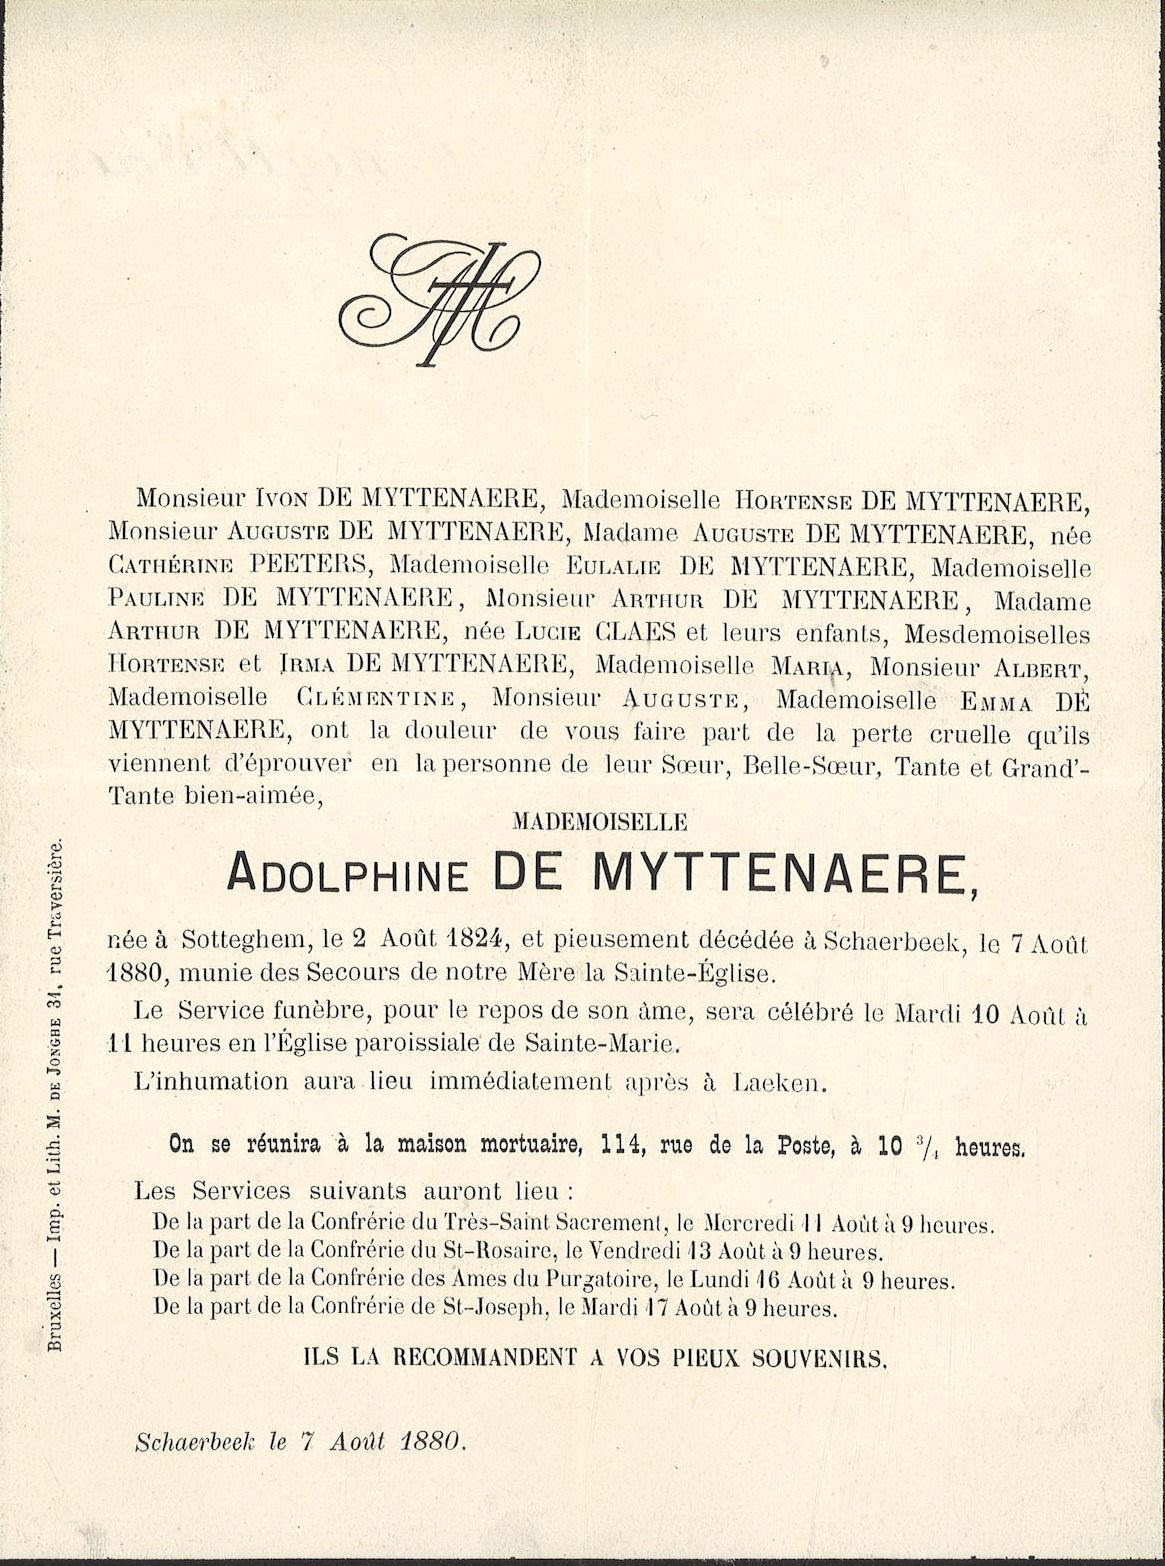 Adolphine De Myttenaere